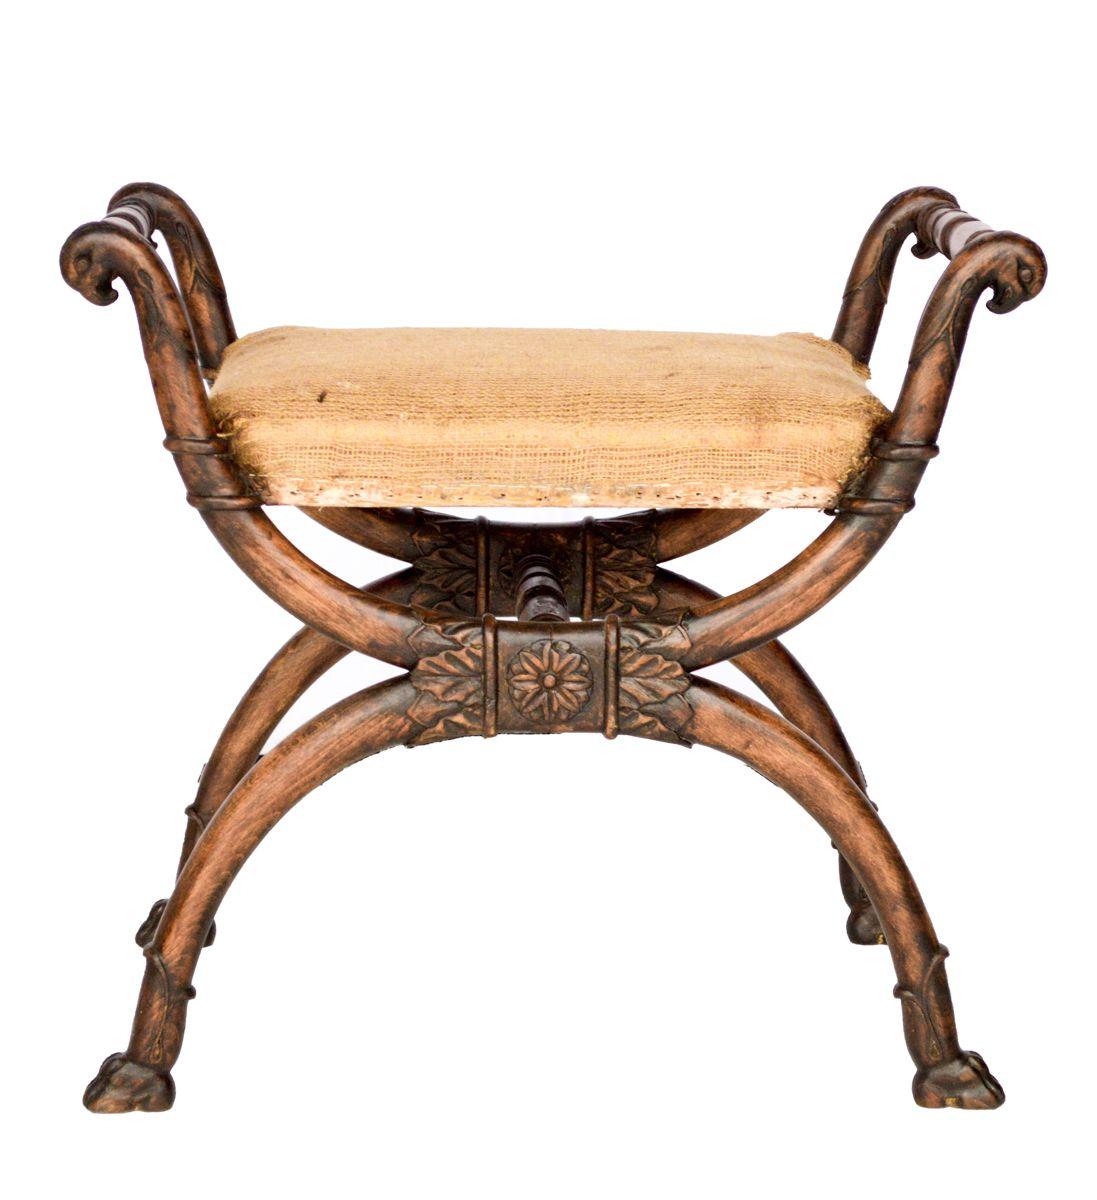 Modern savonarola chair - Modern